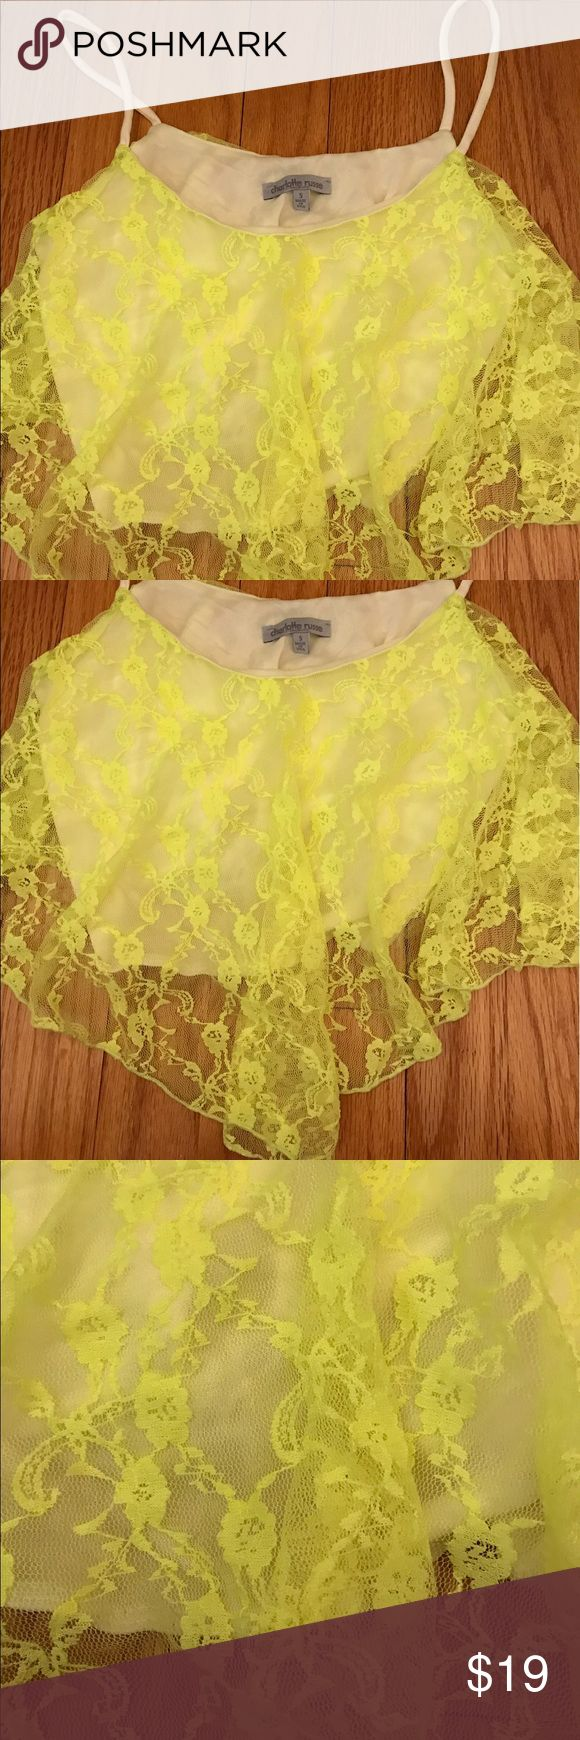 NWOT Charlotte Russe neon yellow lace croptop NWOT Charlotte Russe neon yellow lace croptop Charlotte Russe Tops Crop Tops